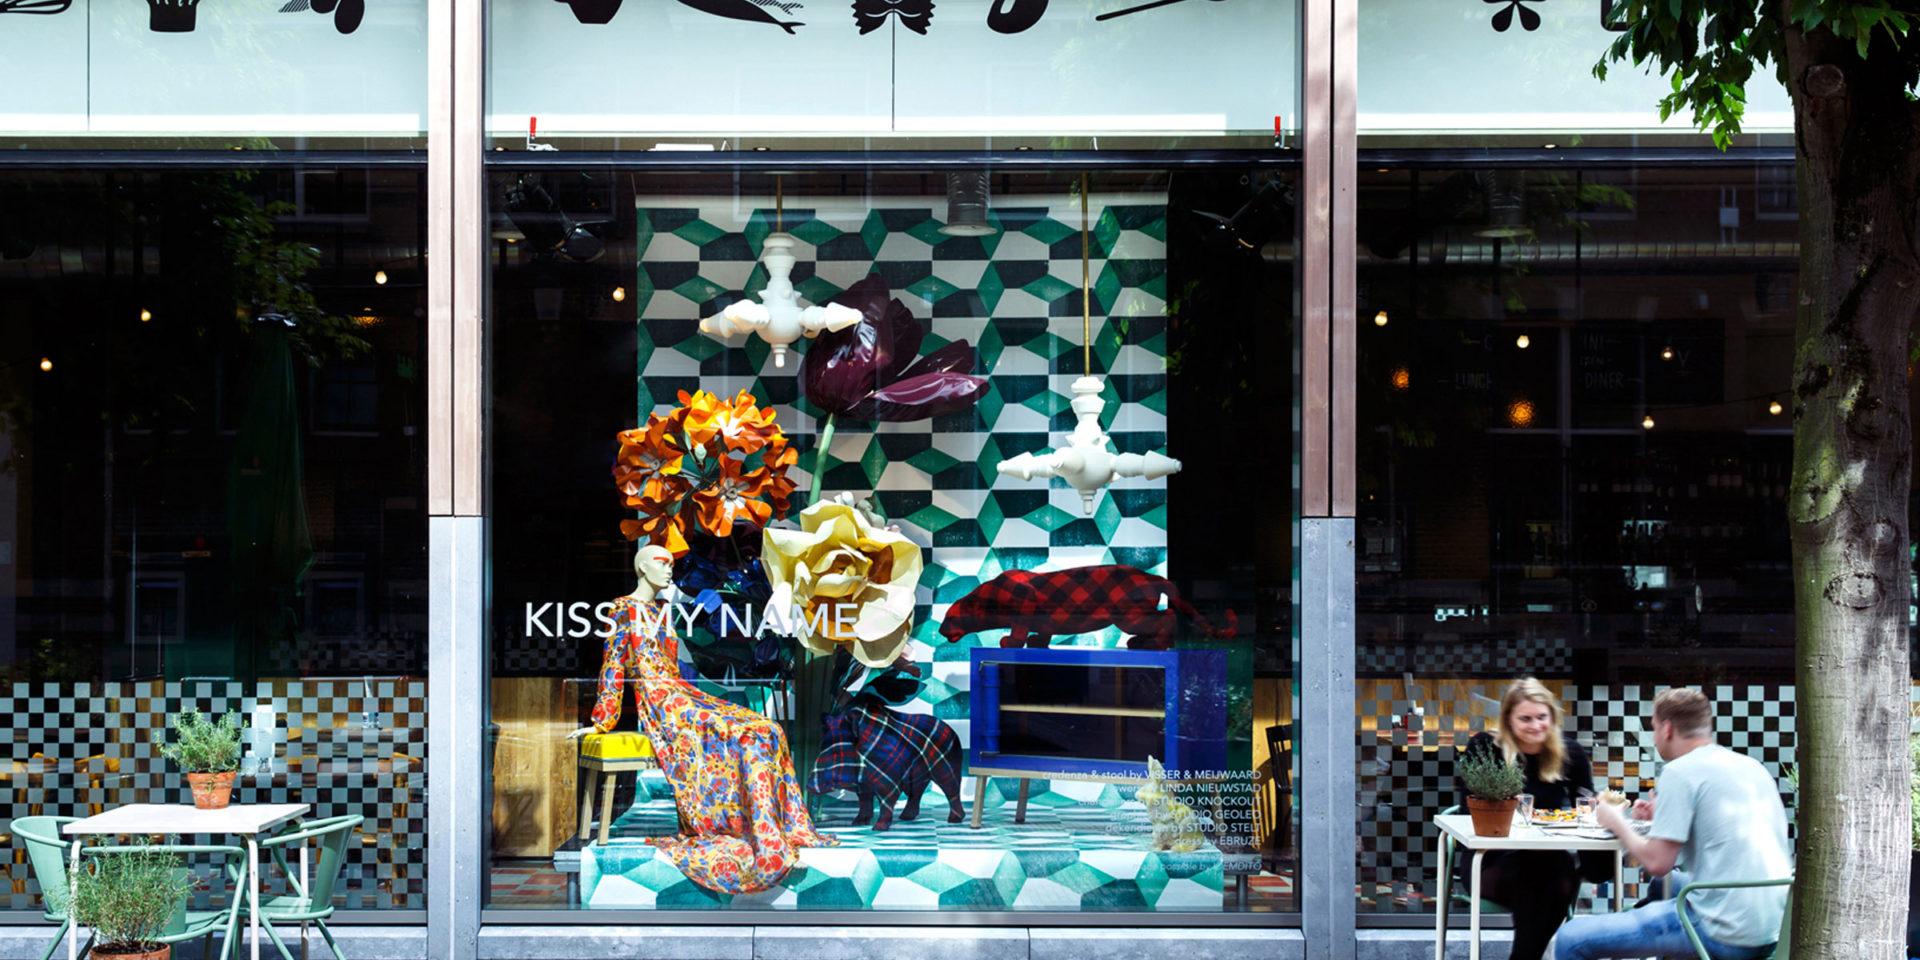 2-kiss-my-name-window-vicini